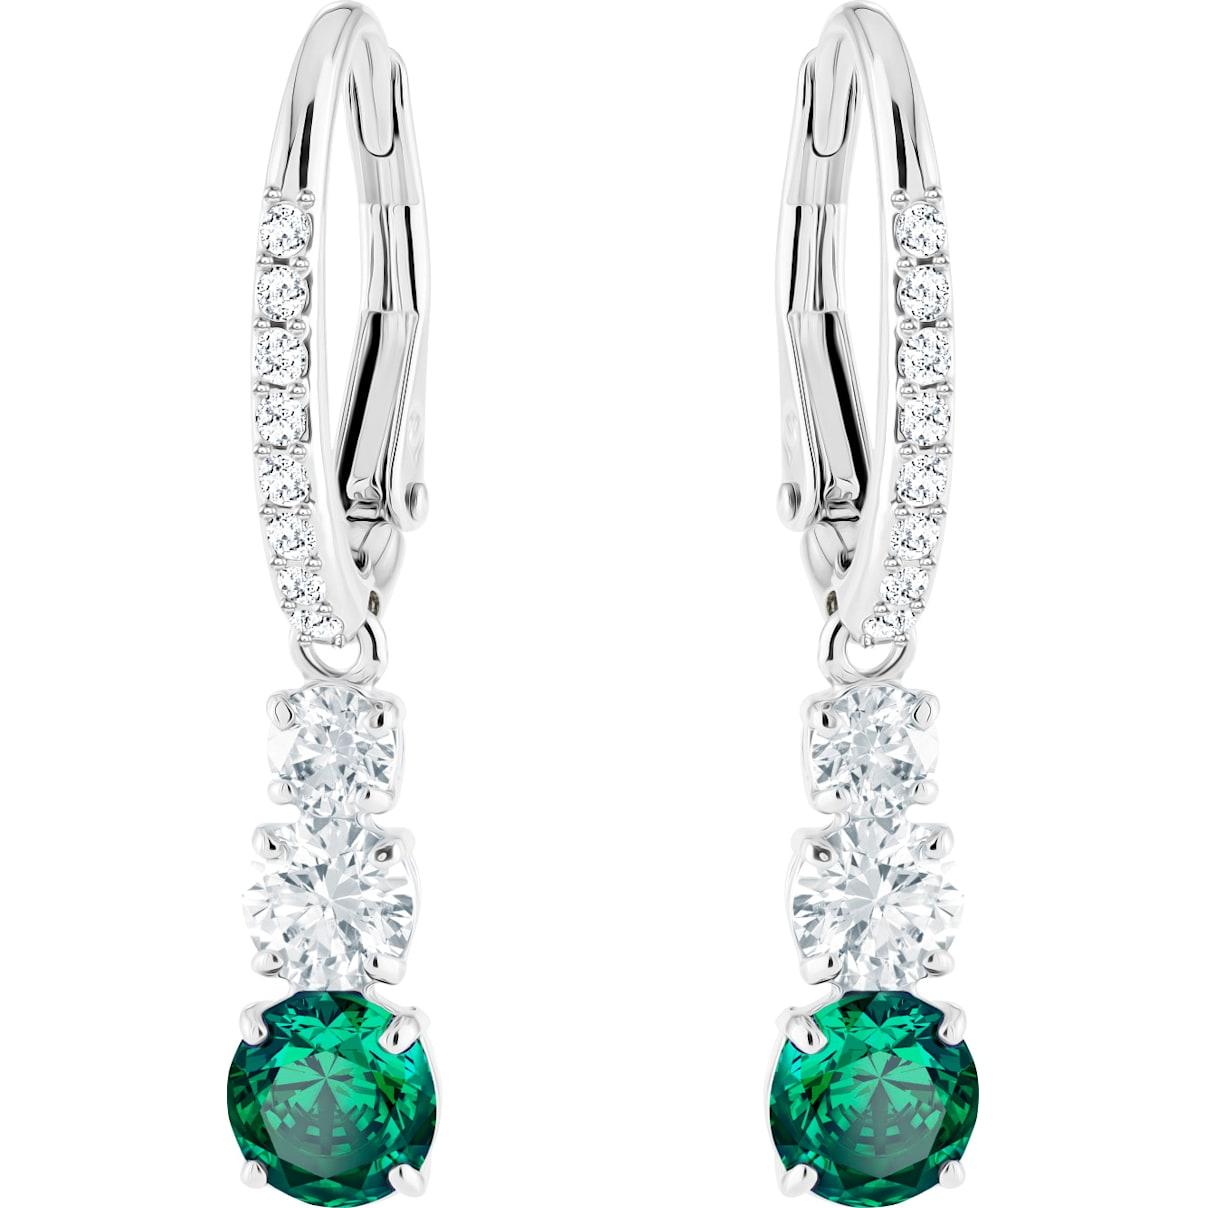 Swarovski Attract Trilogy Round Pierced Earrings, Green, Rhodium plated